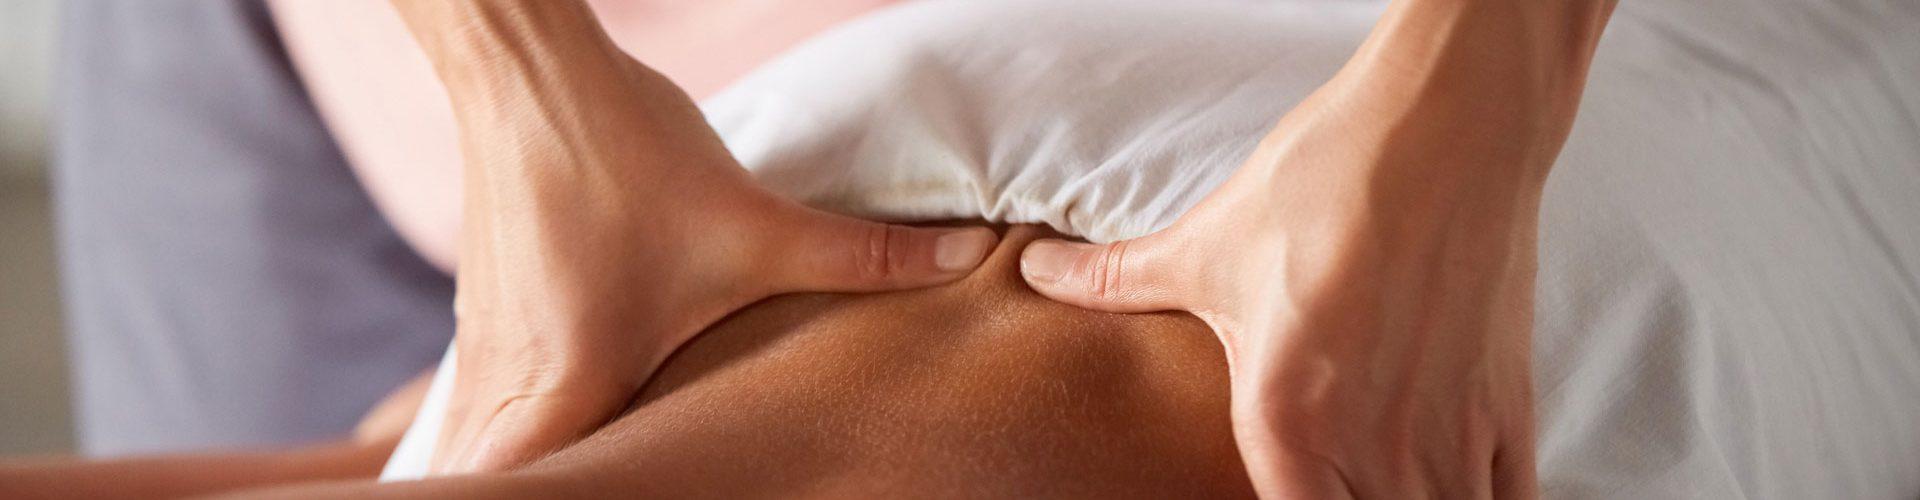 masseuse-doing-massage-for-male-client-K8NDMZ2-1.jpg